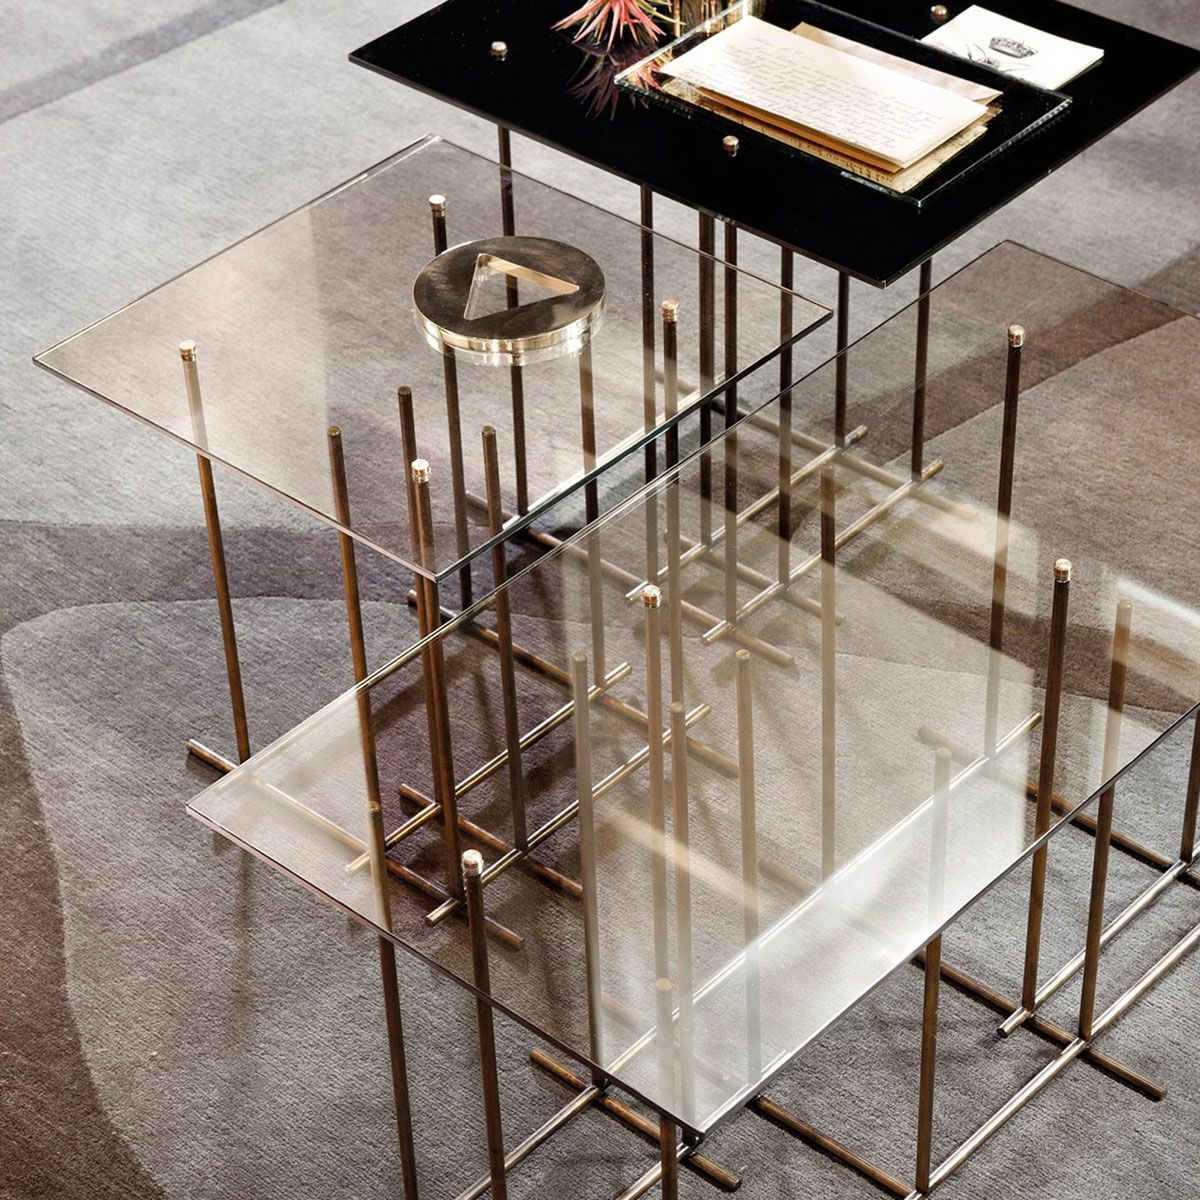 Amazing Stainless Steel Coffee Table Stolik Dlya Kofe Stoliki Zhurnalnyj Stolik [ 2097 x 3145 Pixel ]